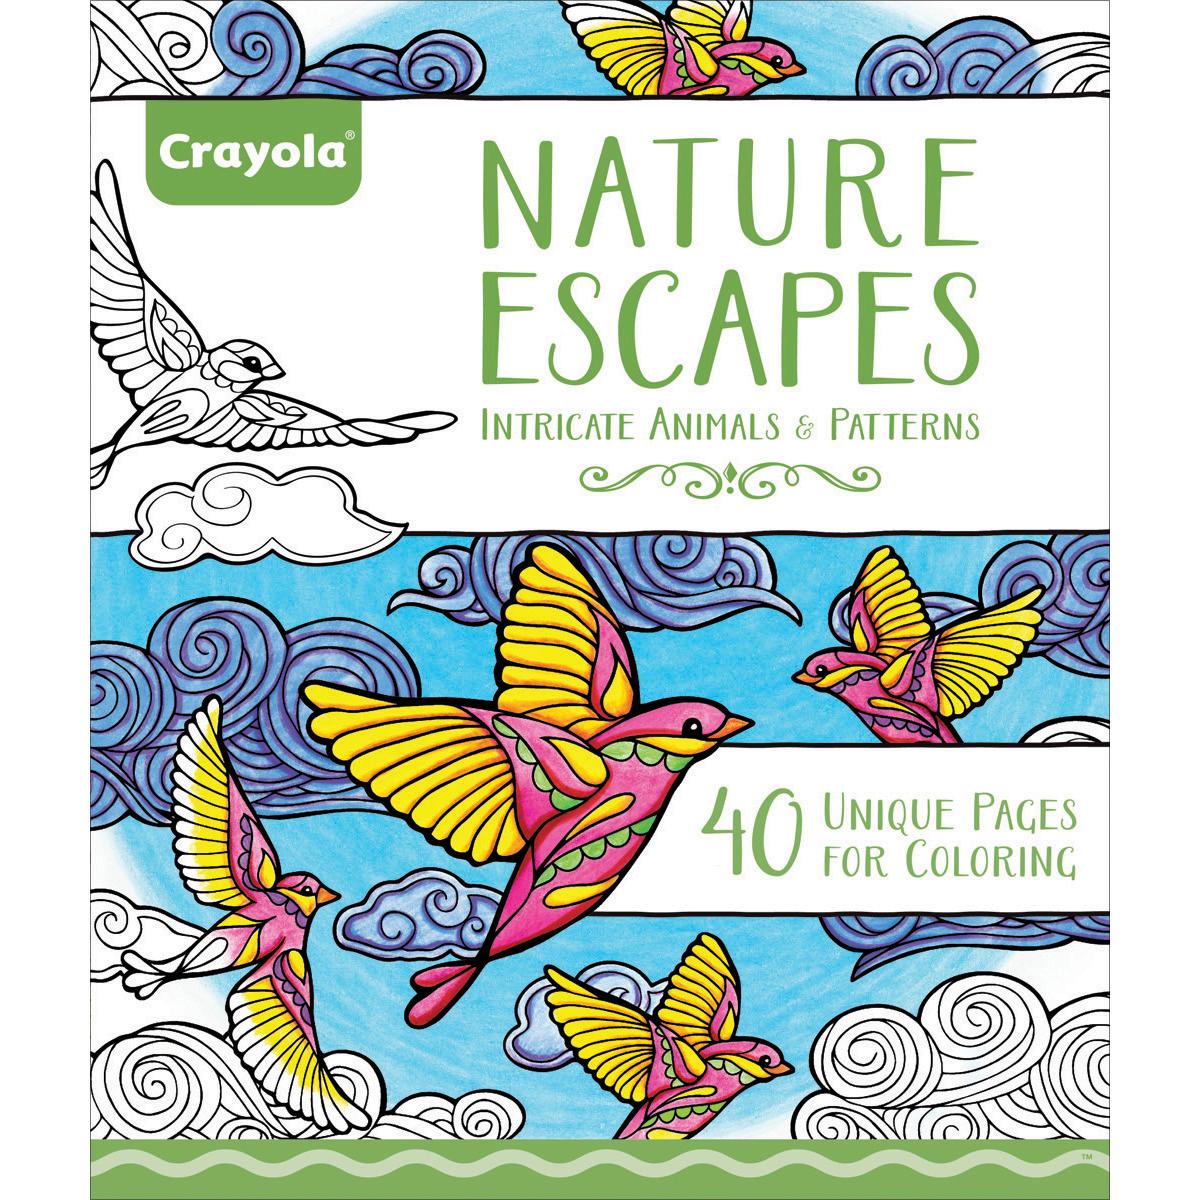 NATURE ESCAPE -CRAYOLA COLORING BOOK